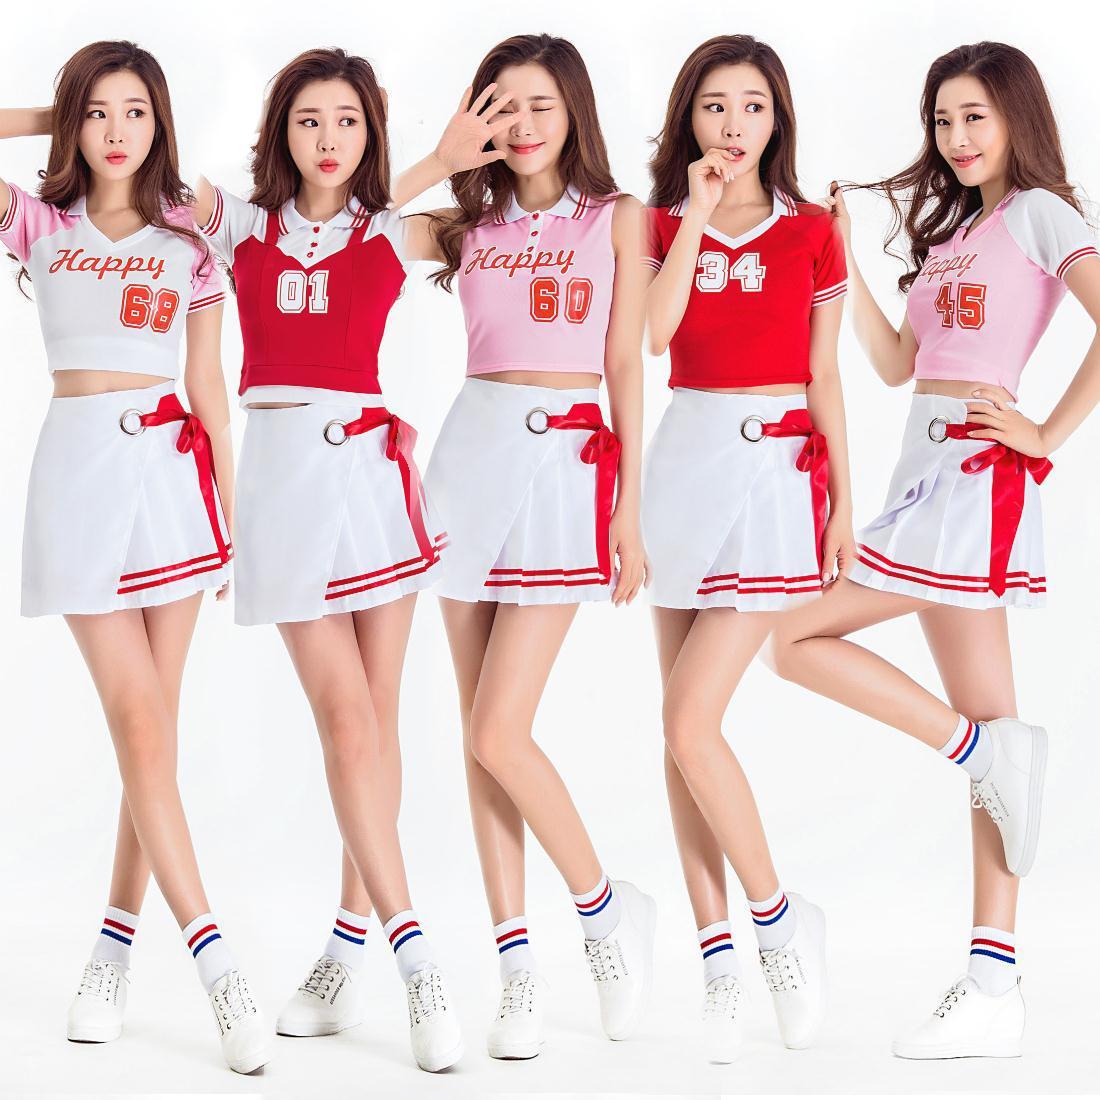 Cheerleading Costume Korean Troupe Cosmos Girls Stage Dance Costumes Women School Uniforms Adults Cheerleader Dancing Costumes